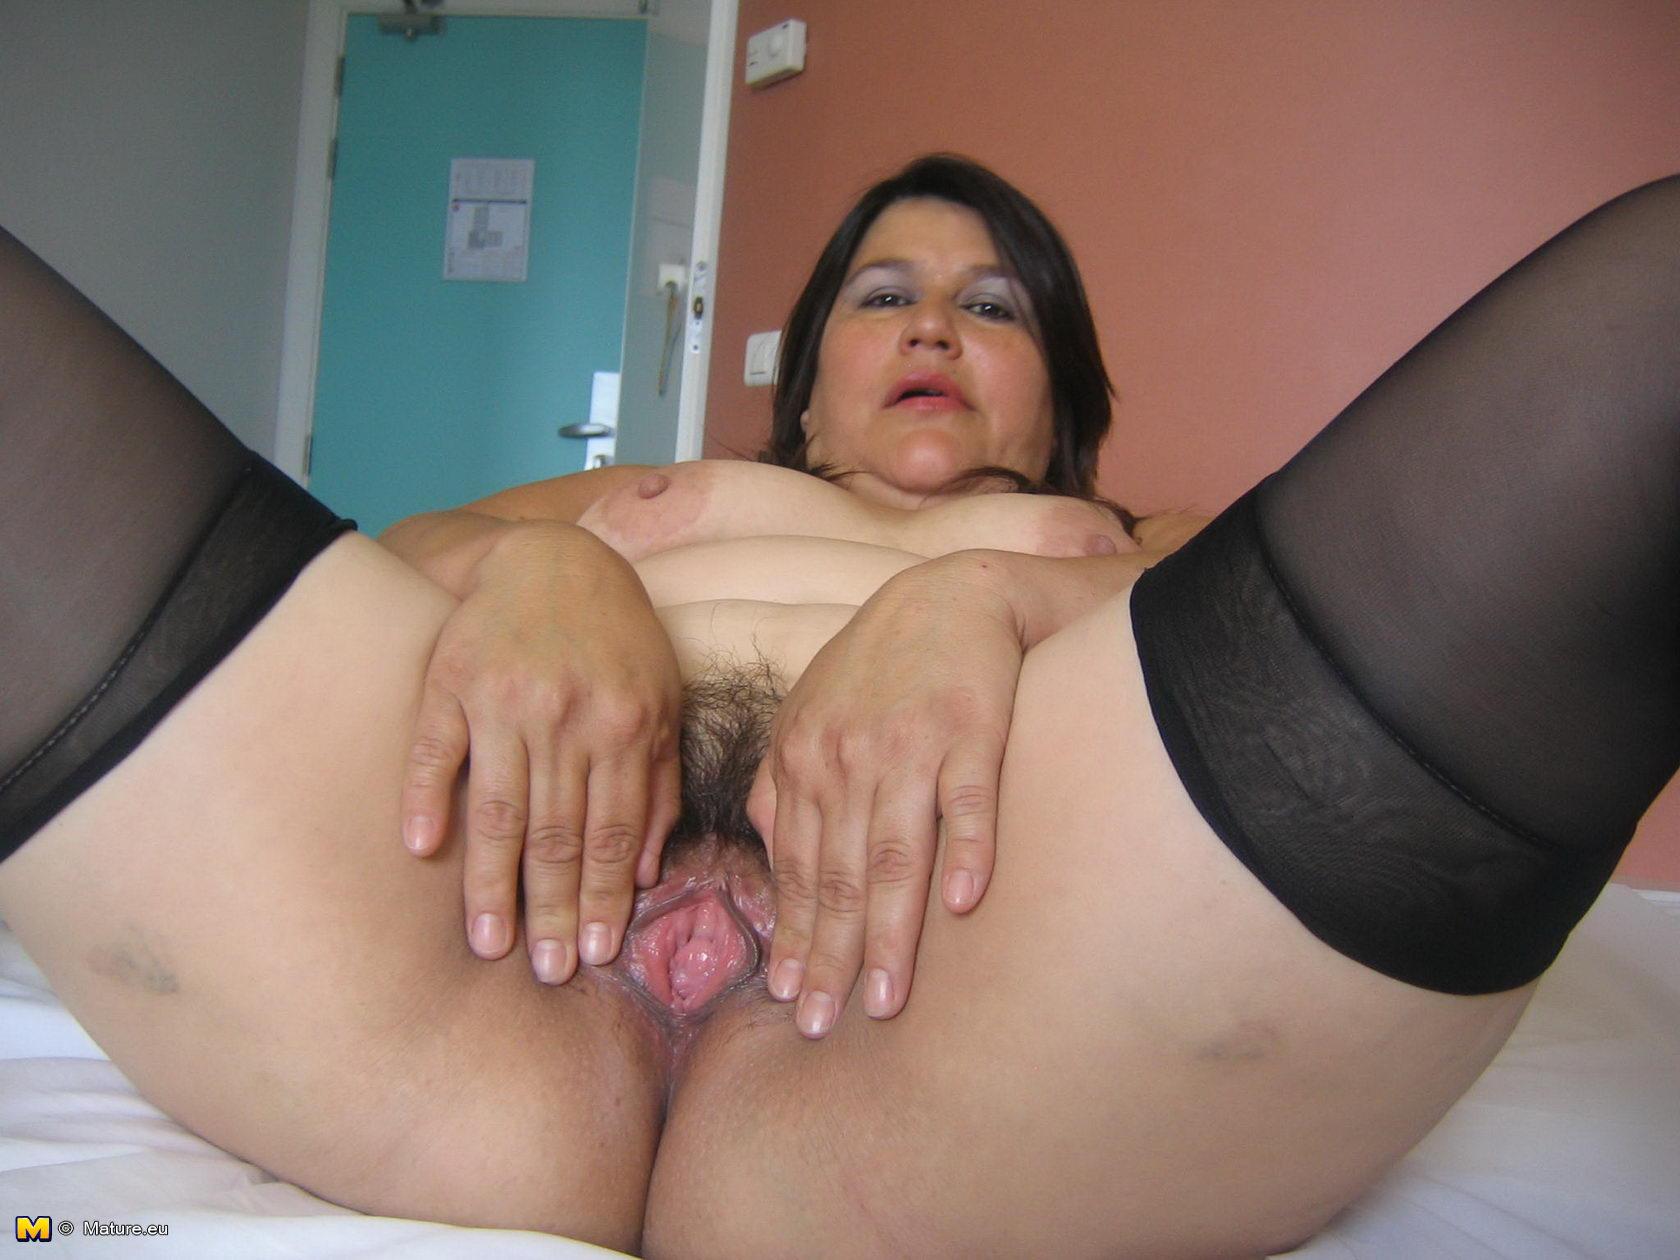 бесплатное фото порно галереи с бабушками